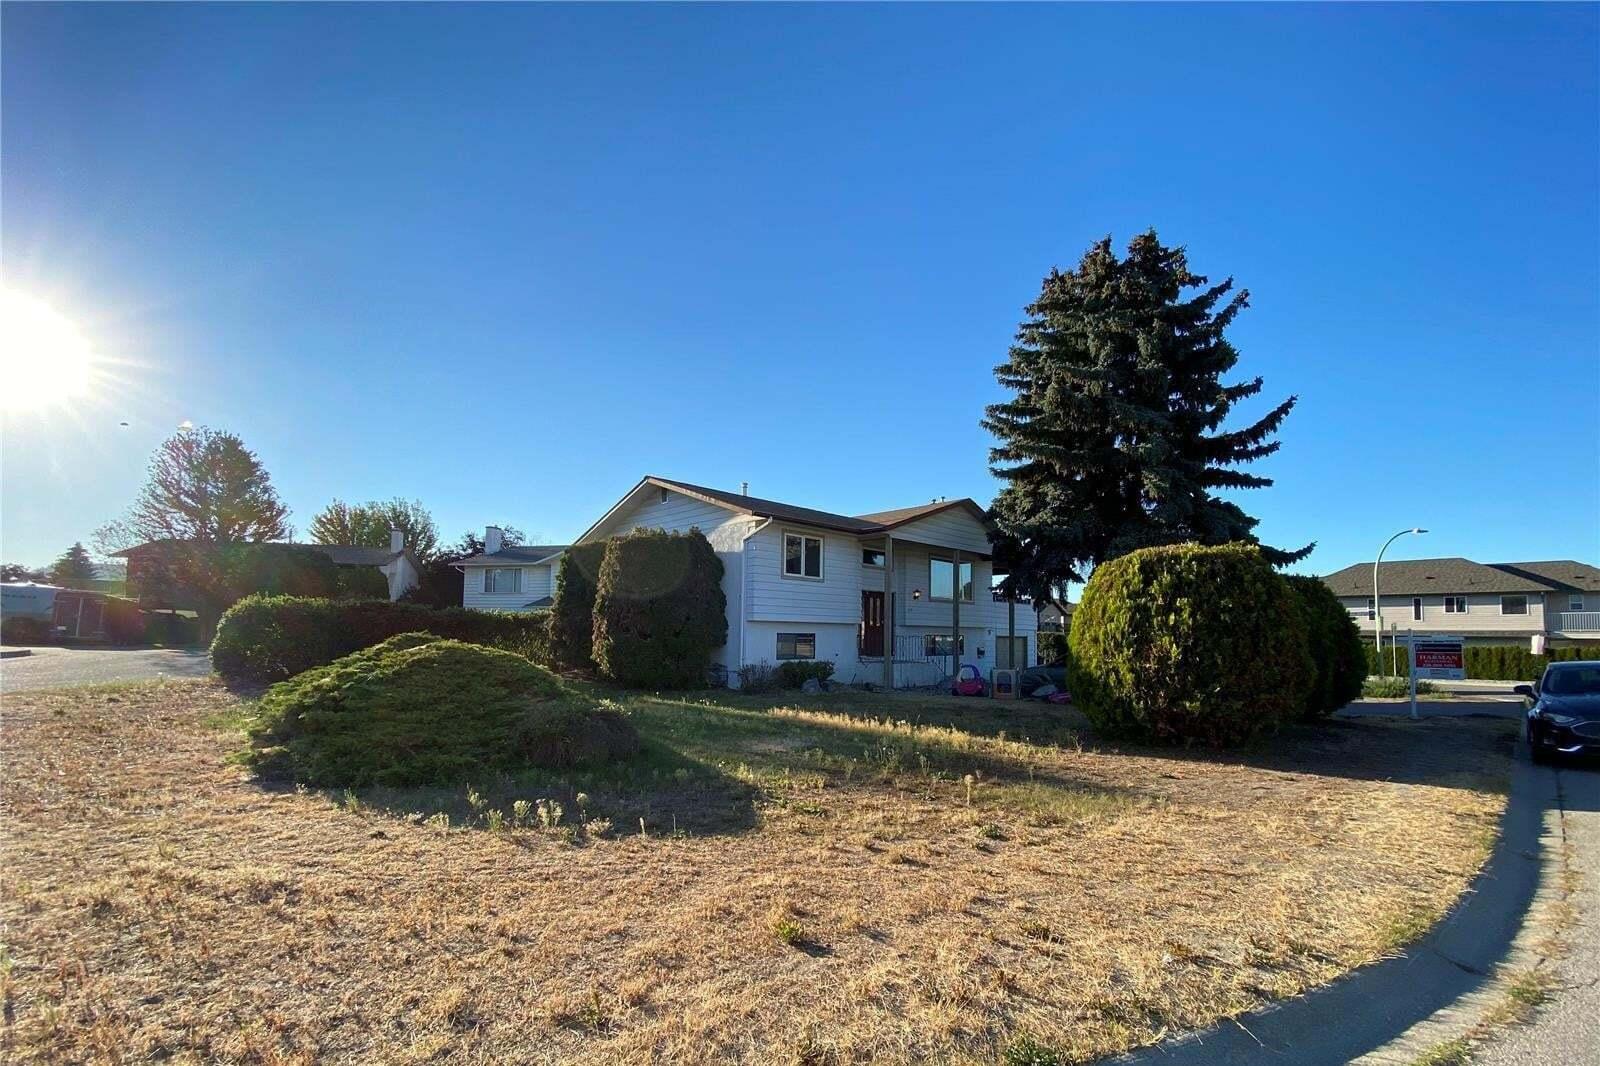 House for sale at 758 Josselyn Ct Kelowna British Columbia - MLS: 10214834